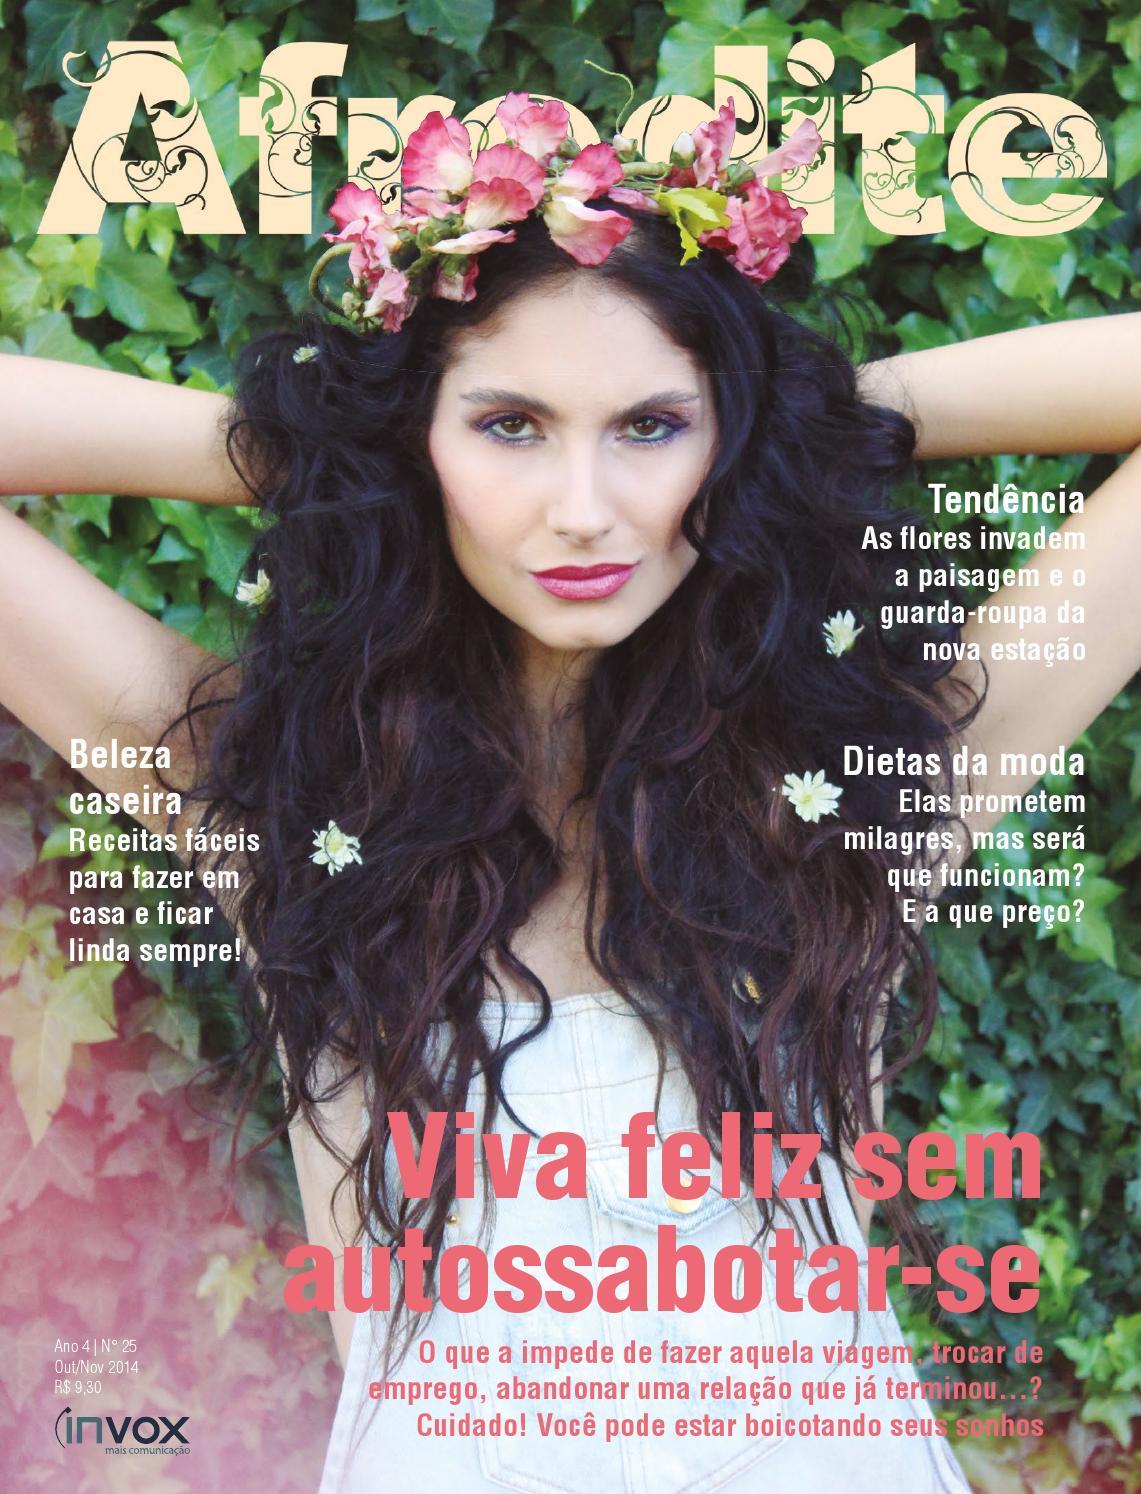 2b7b5aeac0b5f Afrodite25 by RevistaAfrodite - issuu